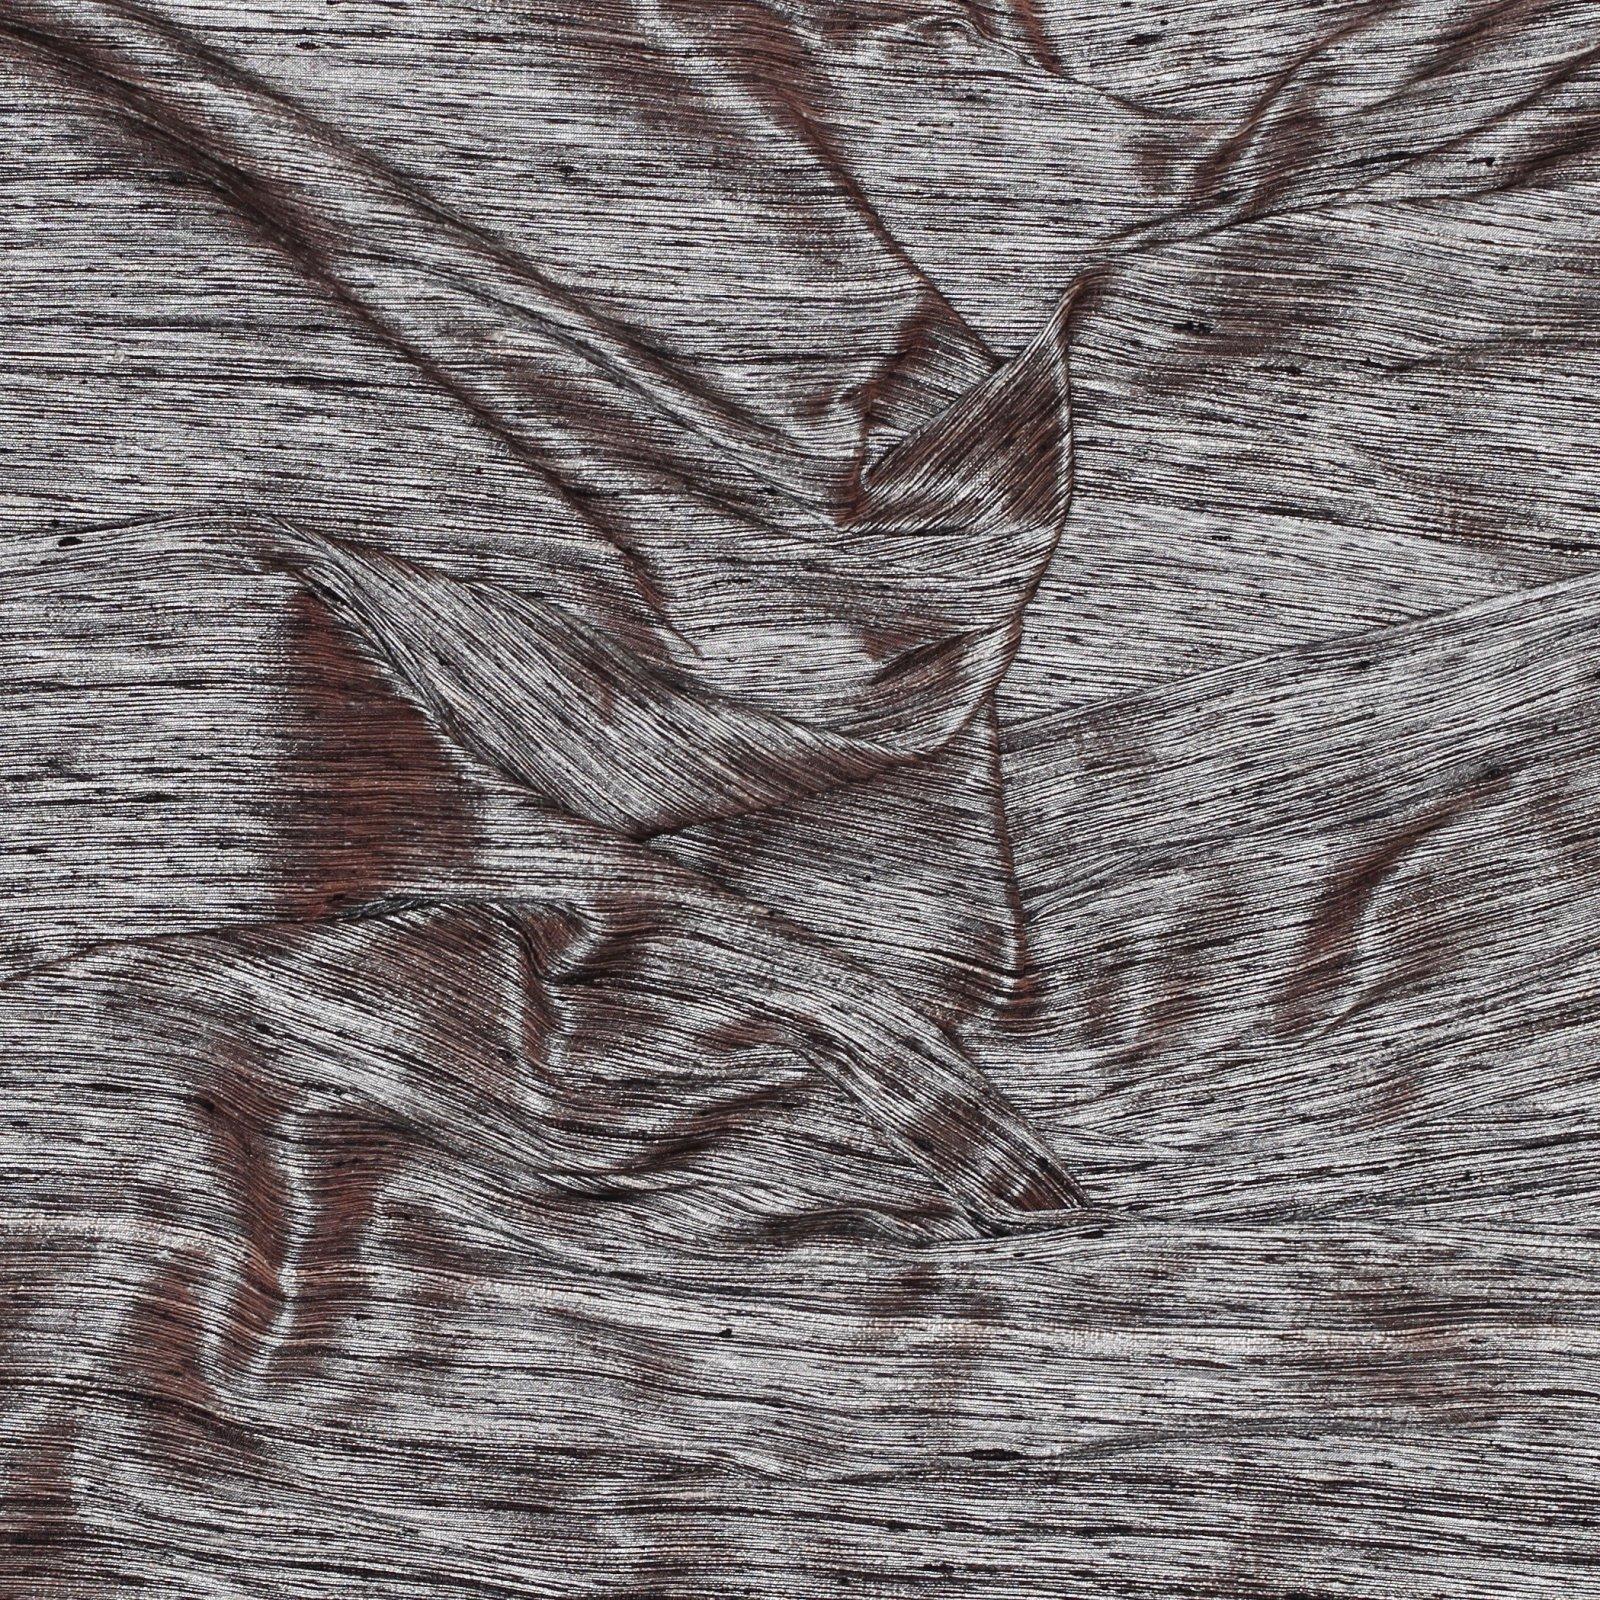 Copper Dupionni-Like Textured Silk